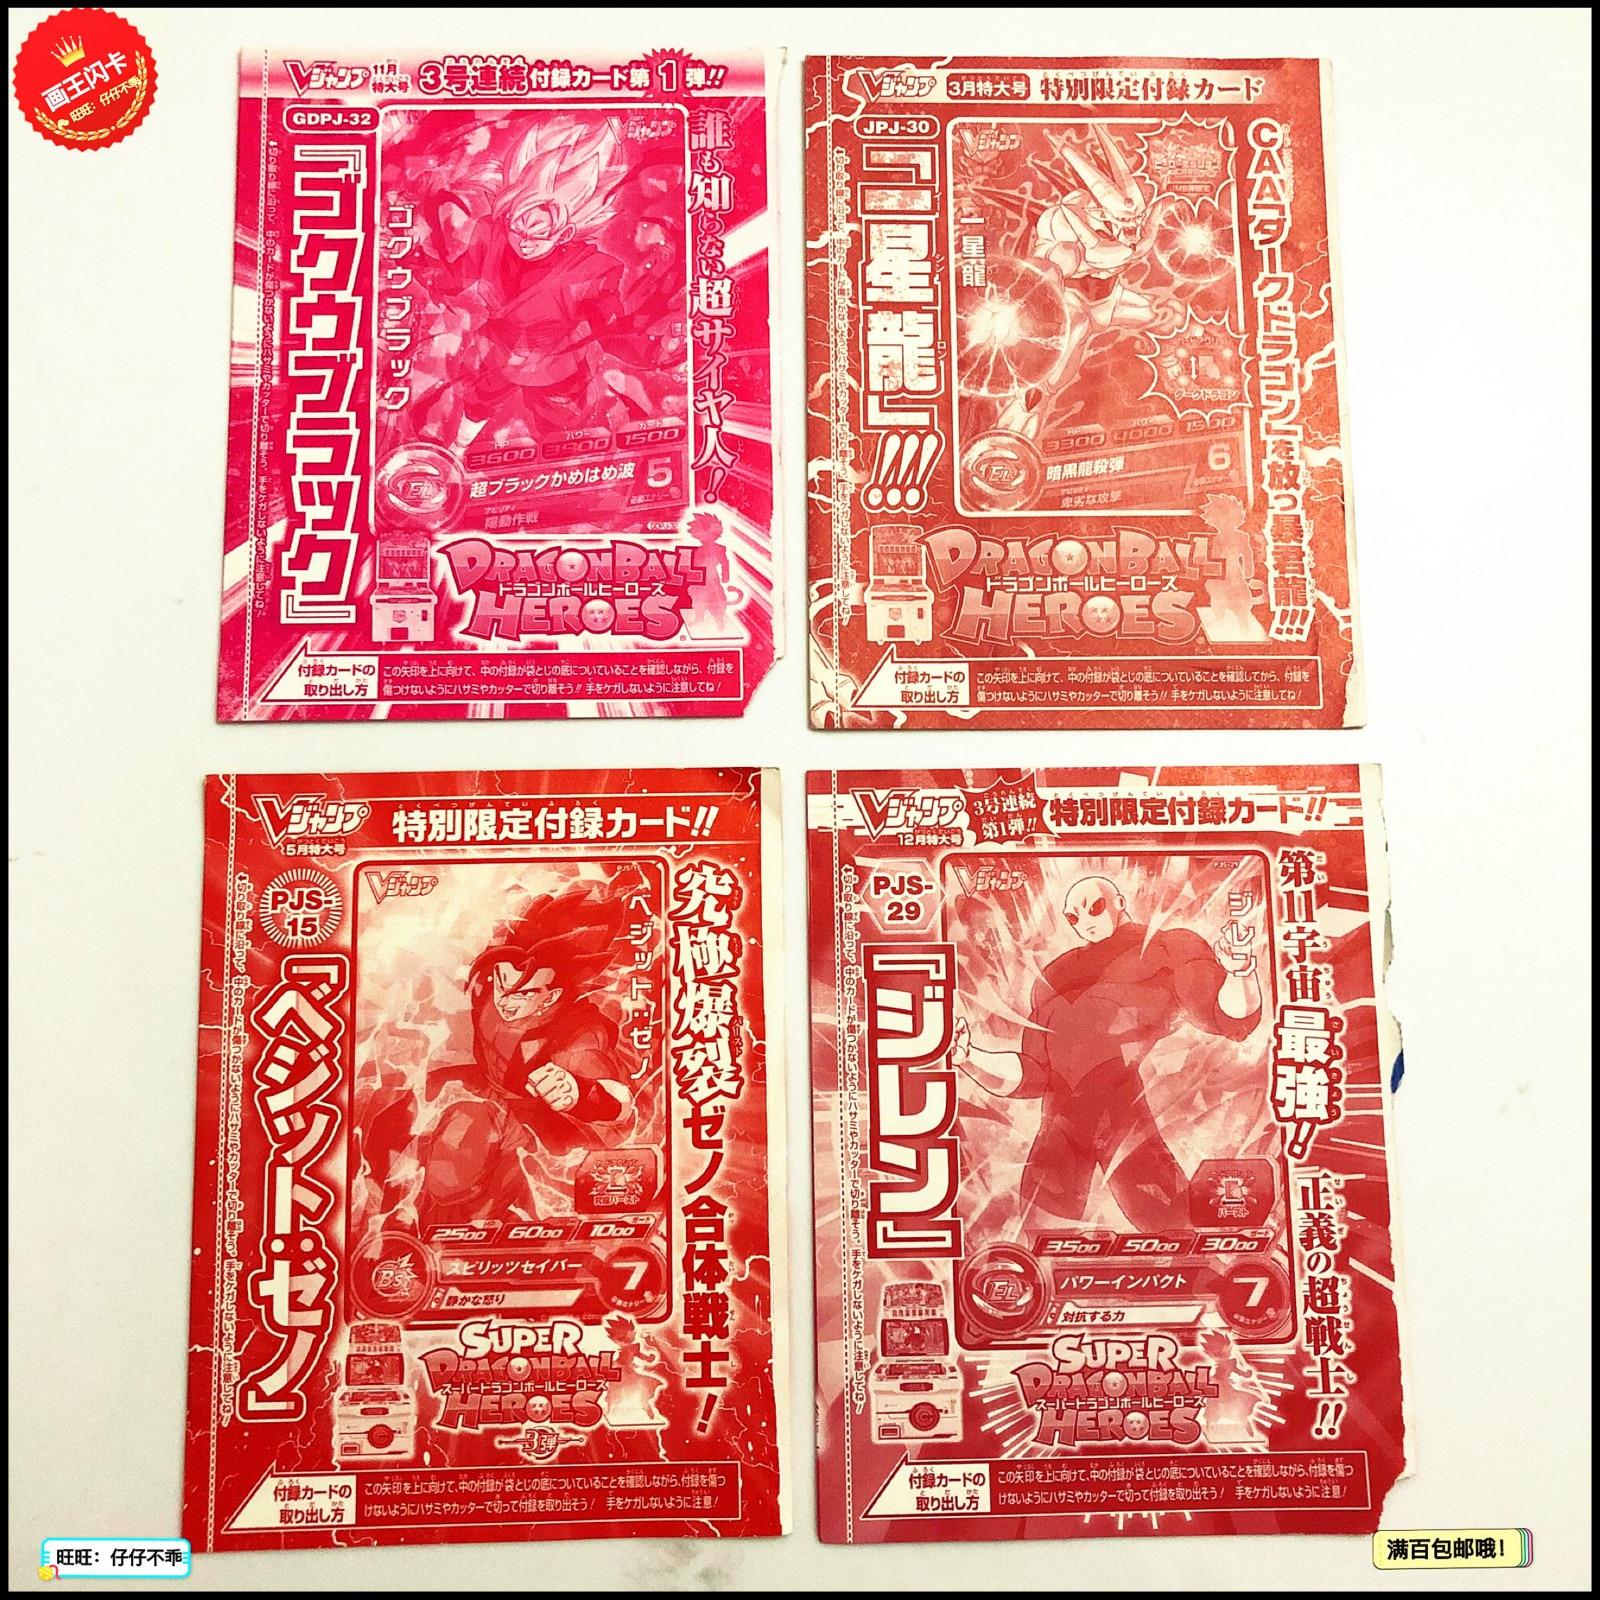 Japan Original Dragon Ball Hero Card PJS GDPJ Goku Toys Hobbies Collectibles Game Collection Anime Cards